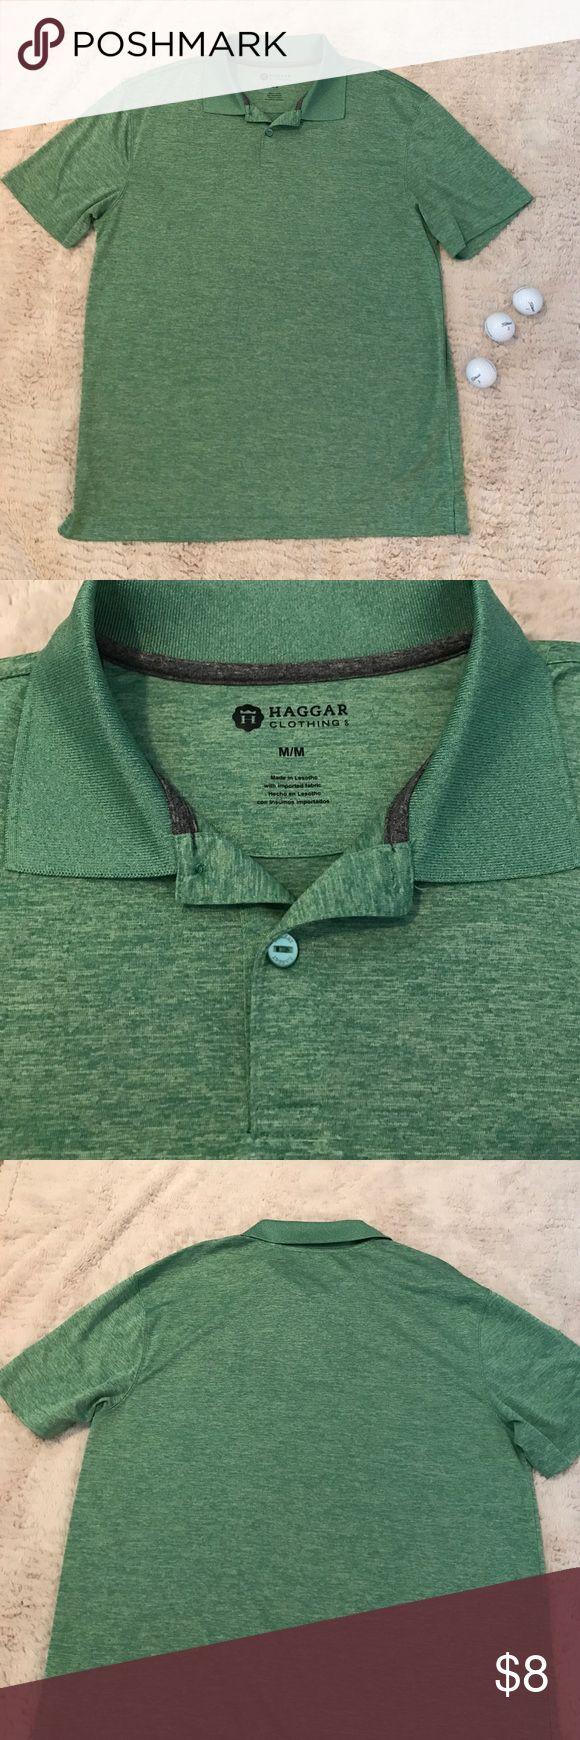 Men's golf shirt Men's golf shirt size medium, Haggar brand from Kohls, really pretty green color. Haggar Shirts Polos